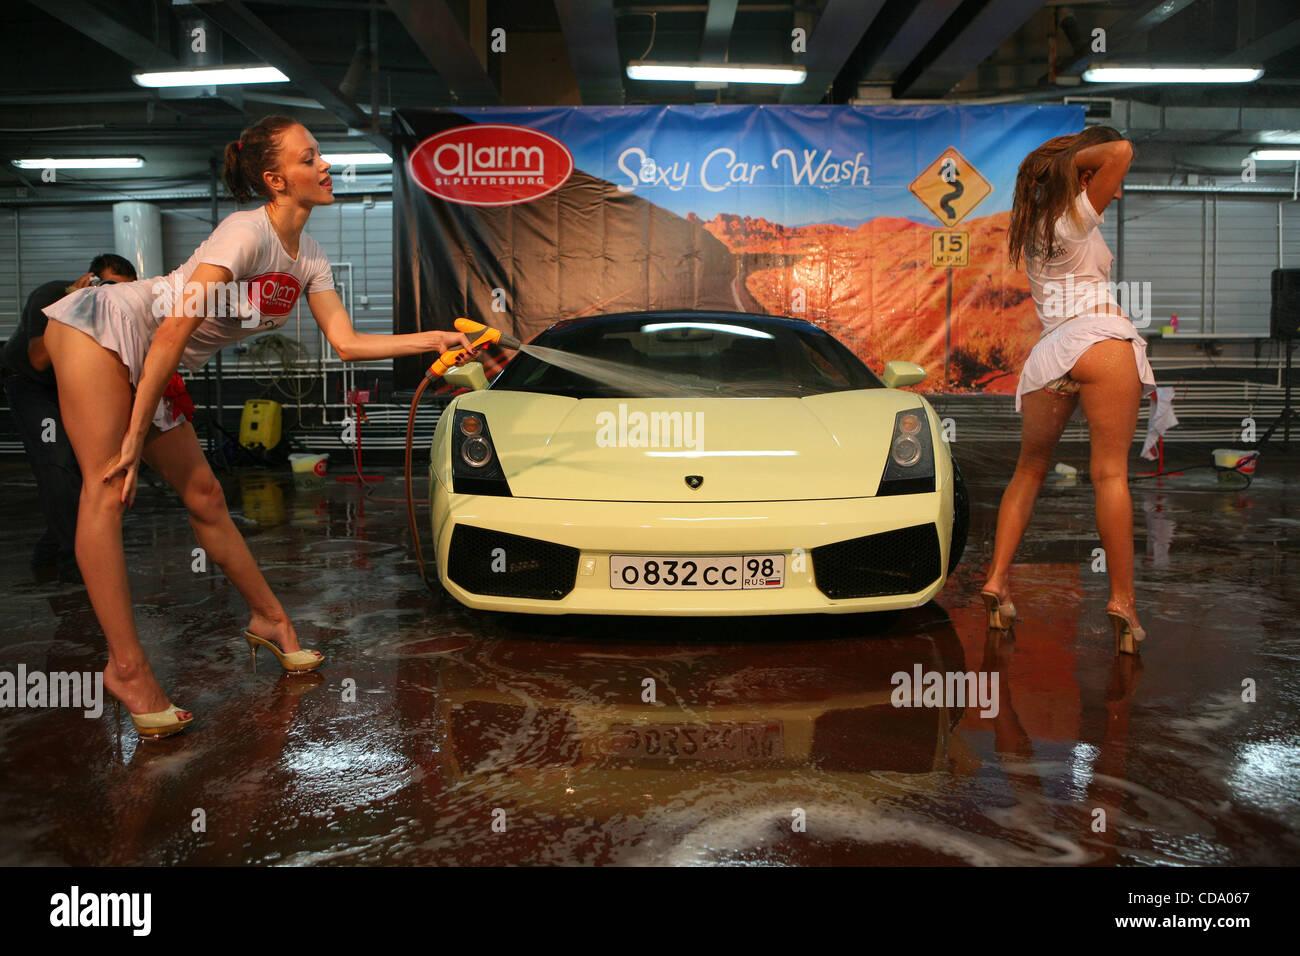 Car Wash Expires